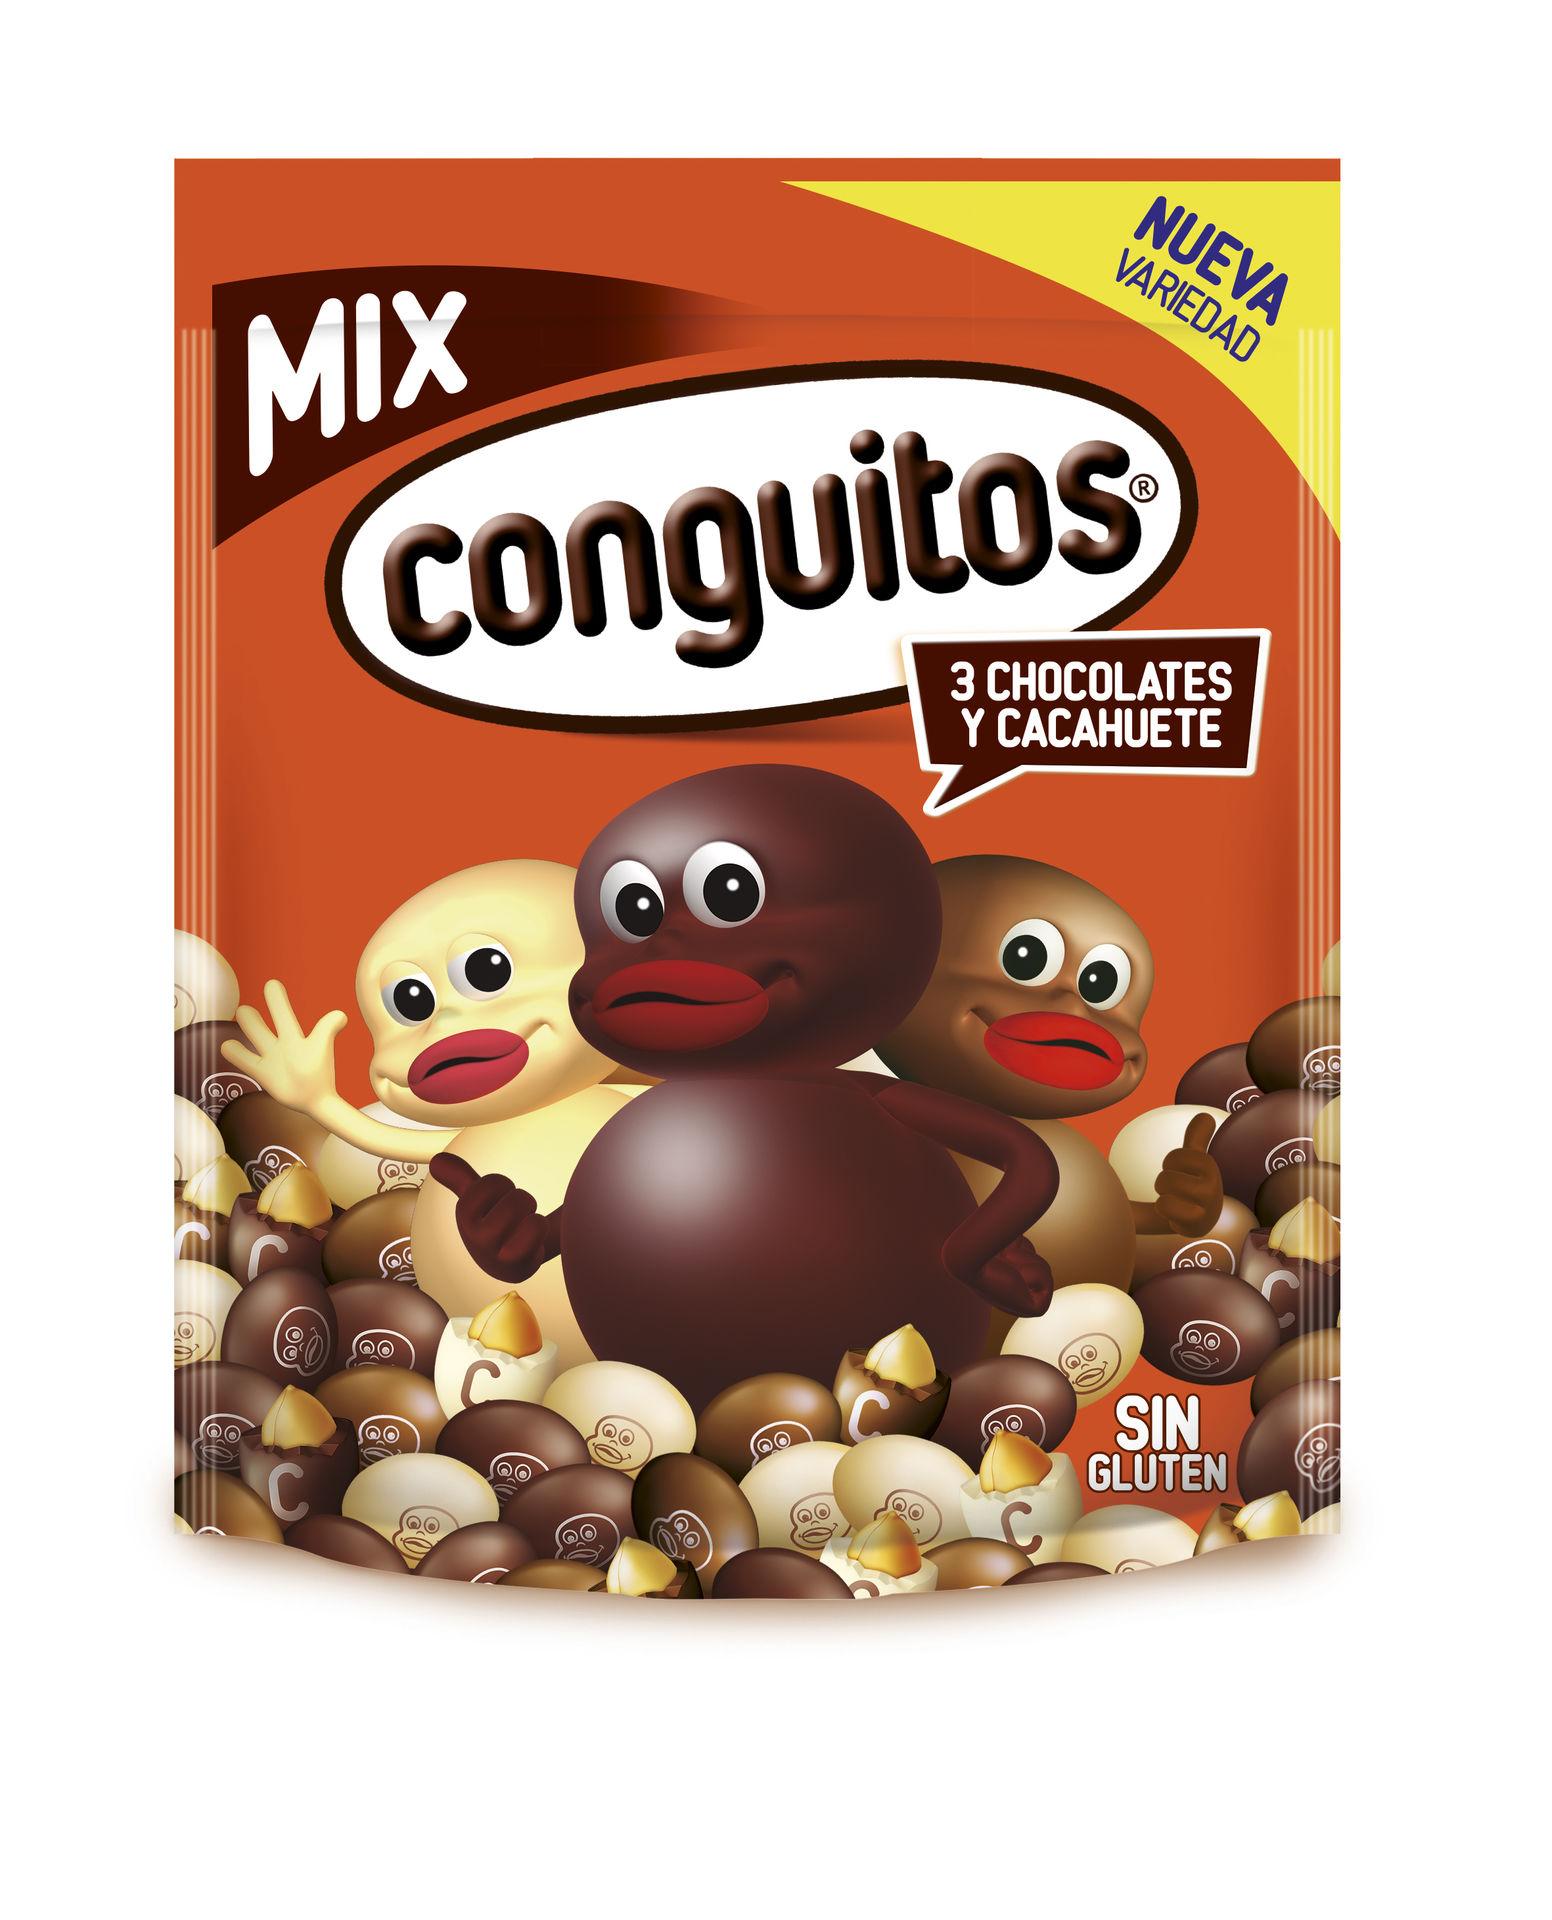 conguitos-mix.jpg